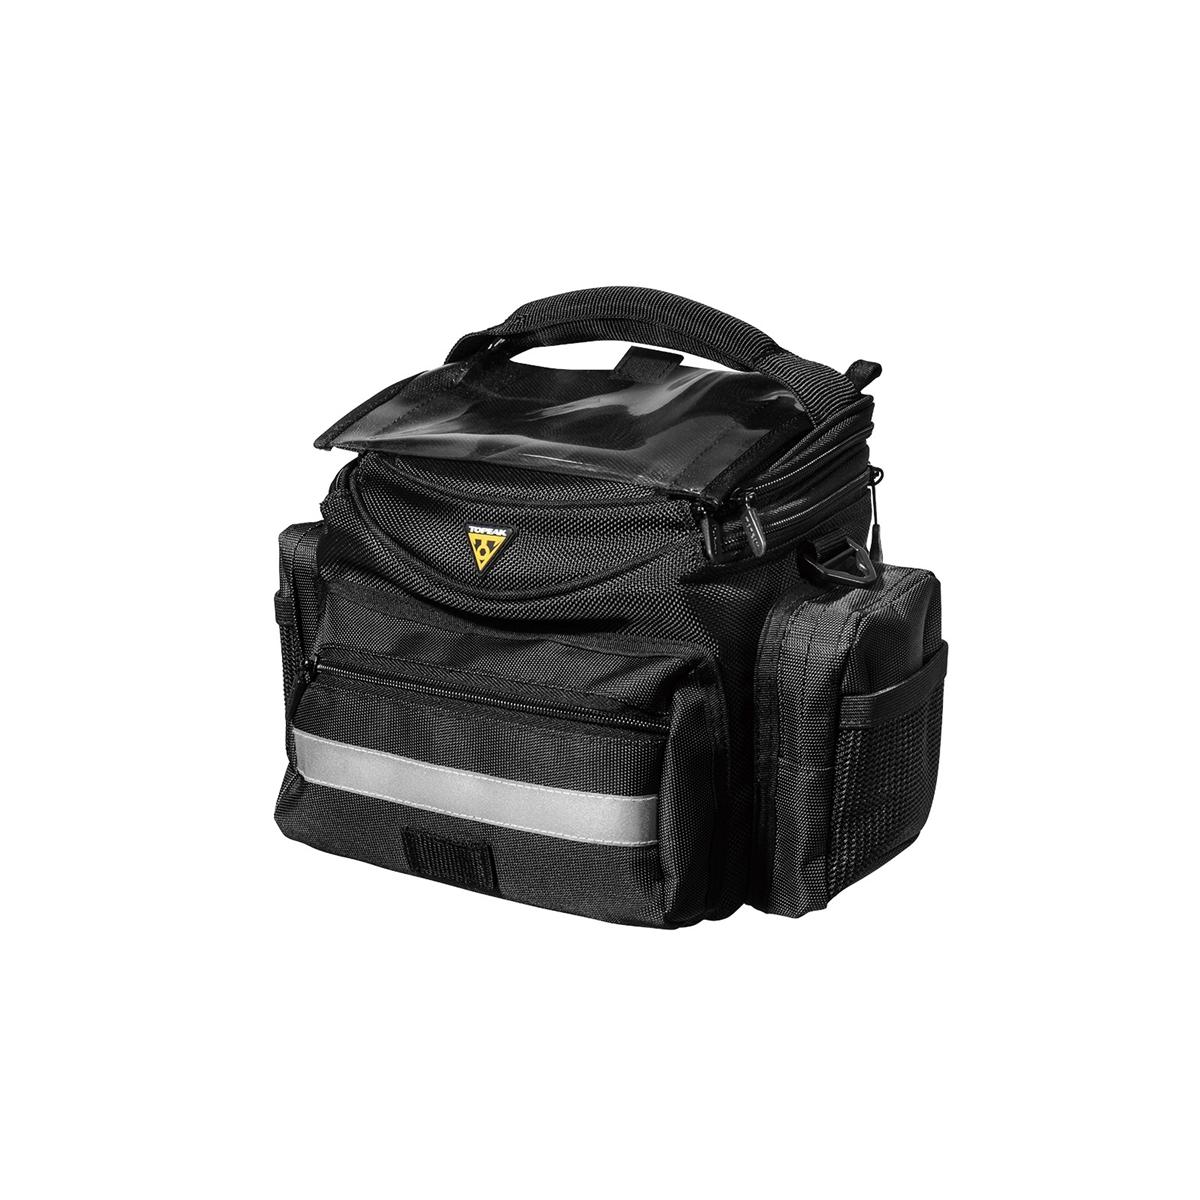 Borsa al Manubrio TourGuide Handlebar Bag 5L Attacco Fixer 8 QuickClick